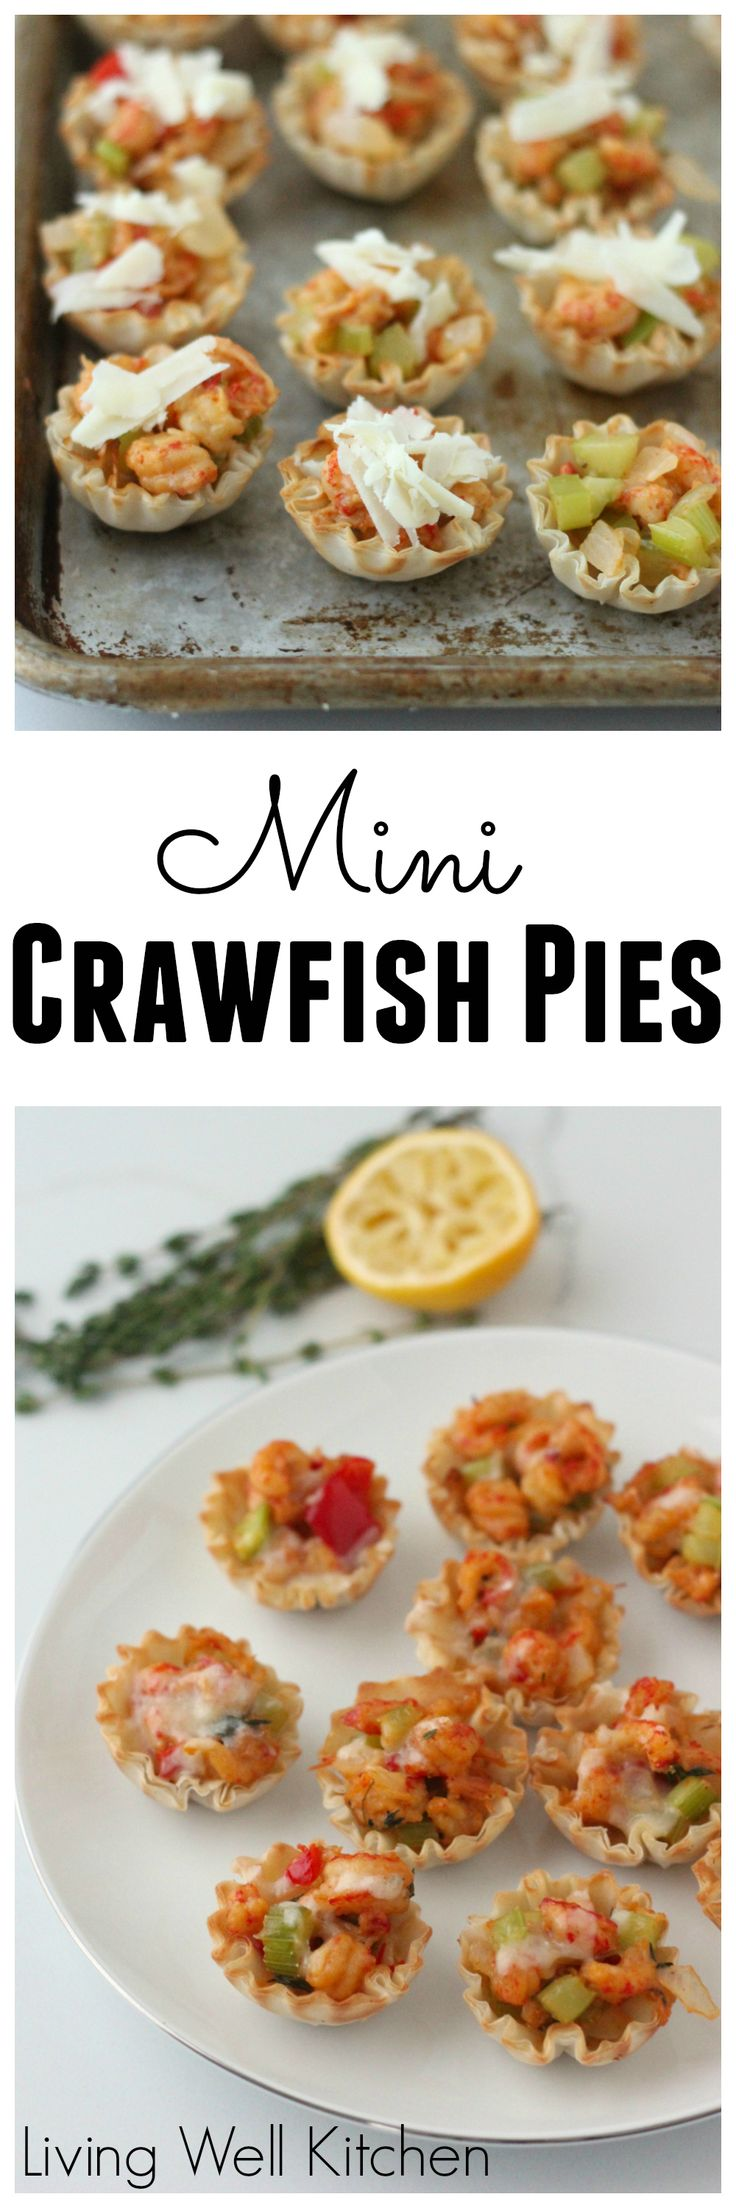 Best 25+ Live Crawfish Ideas On Pinterest  Boiling Crawfish, Crawfish  Recipes And Cajun Crawfish